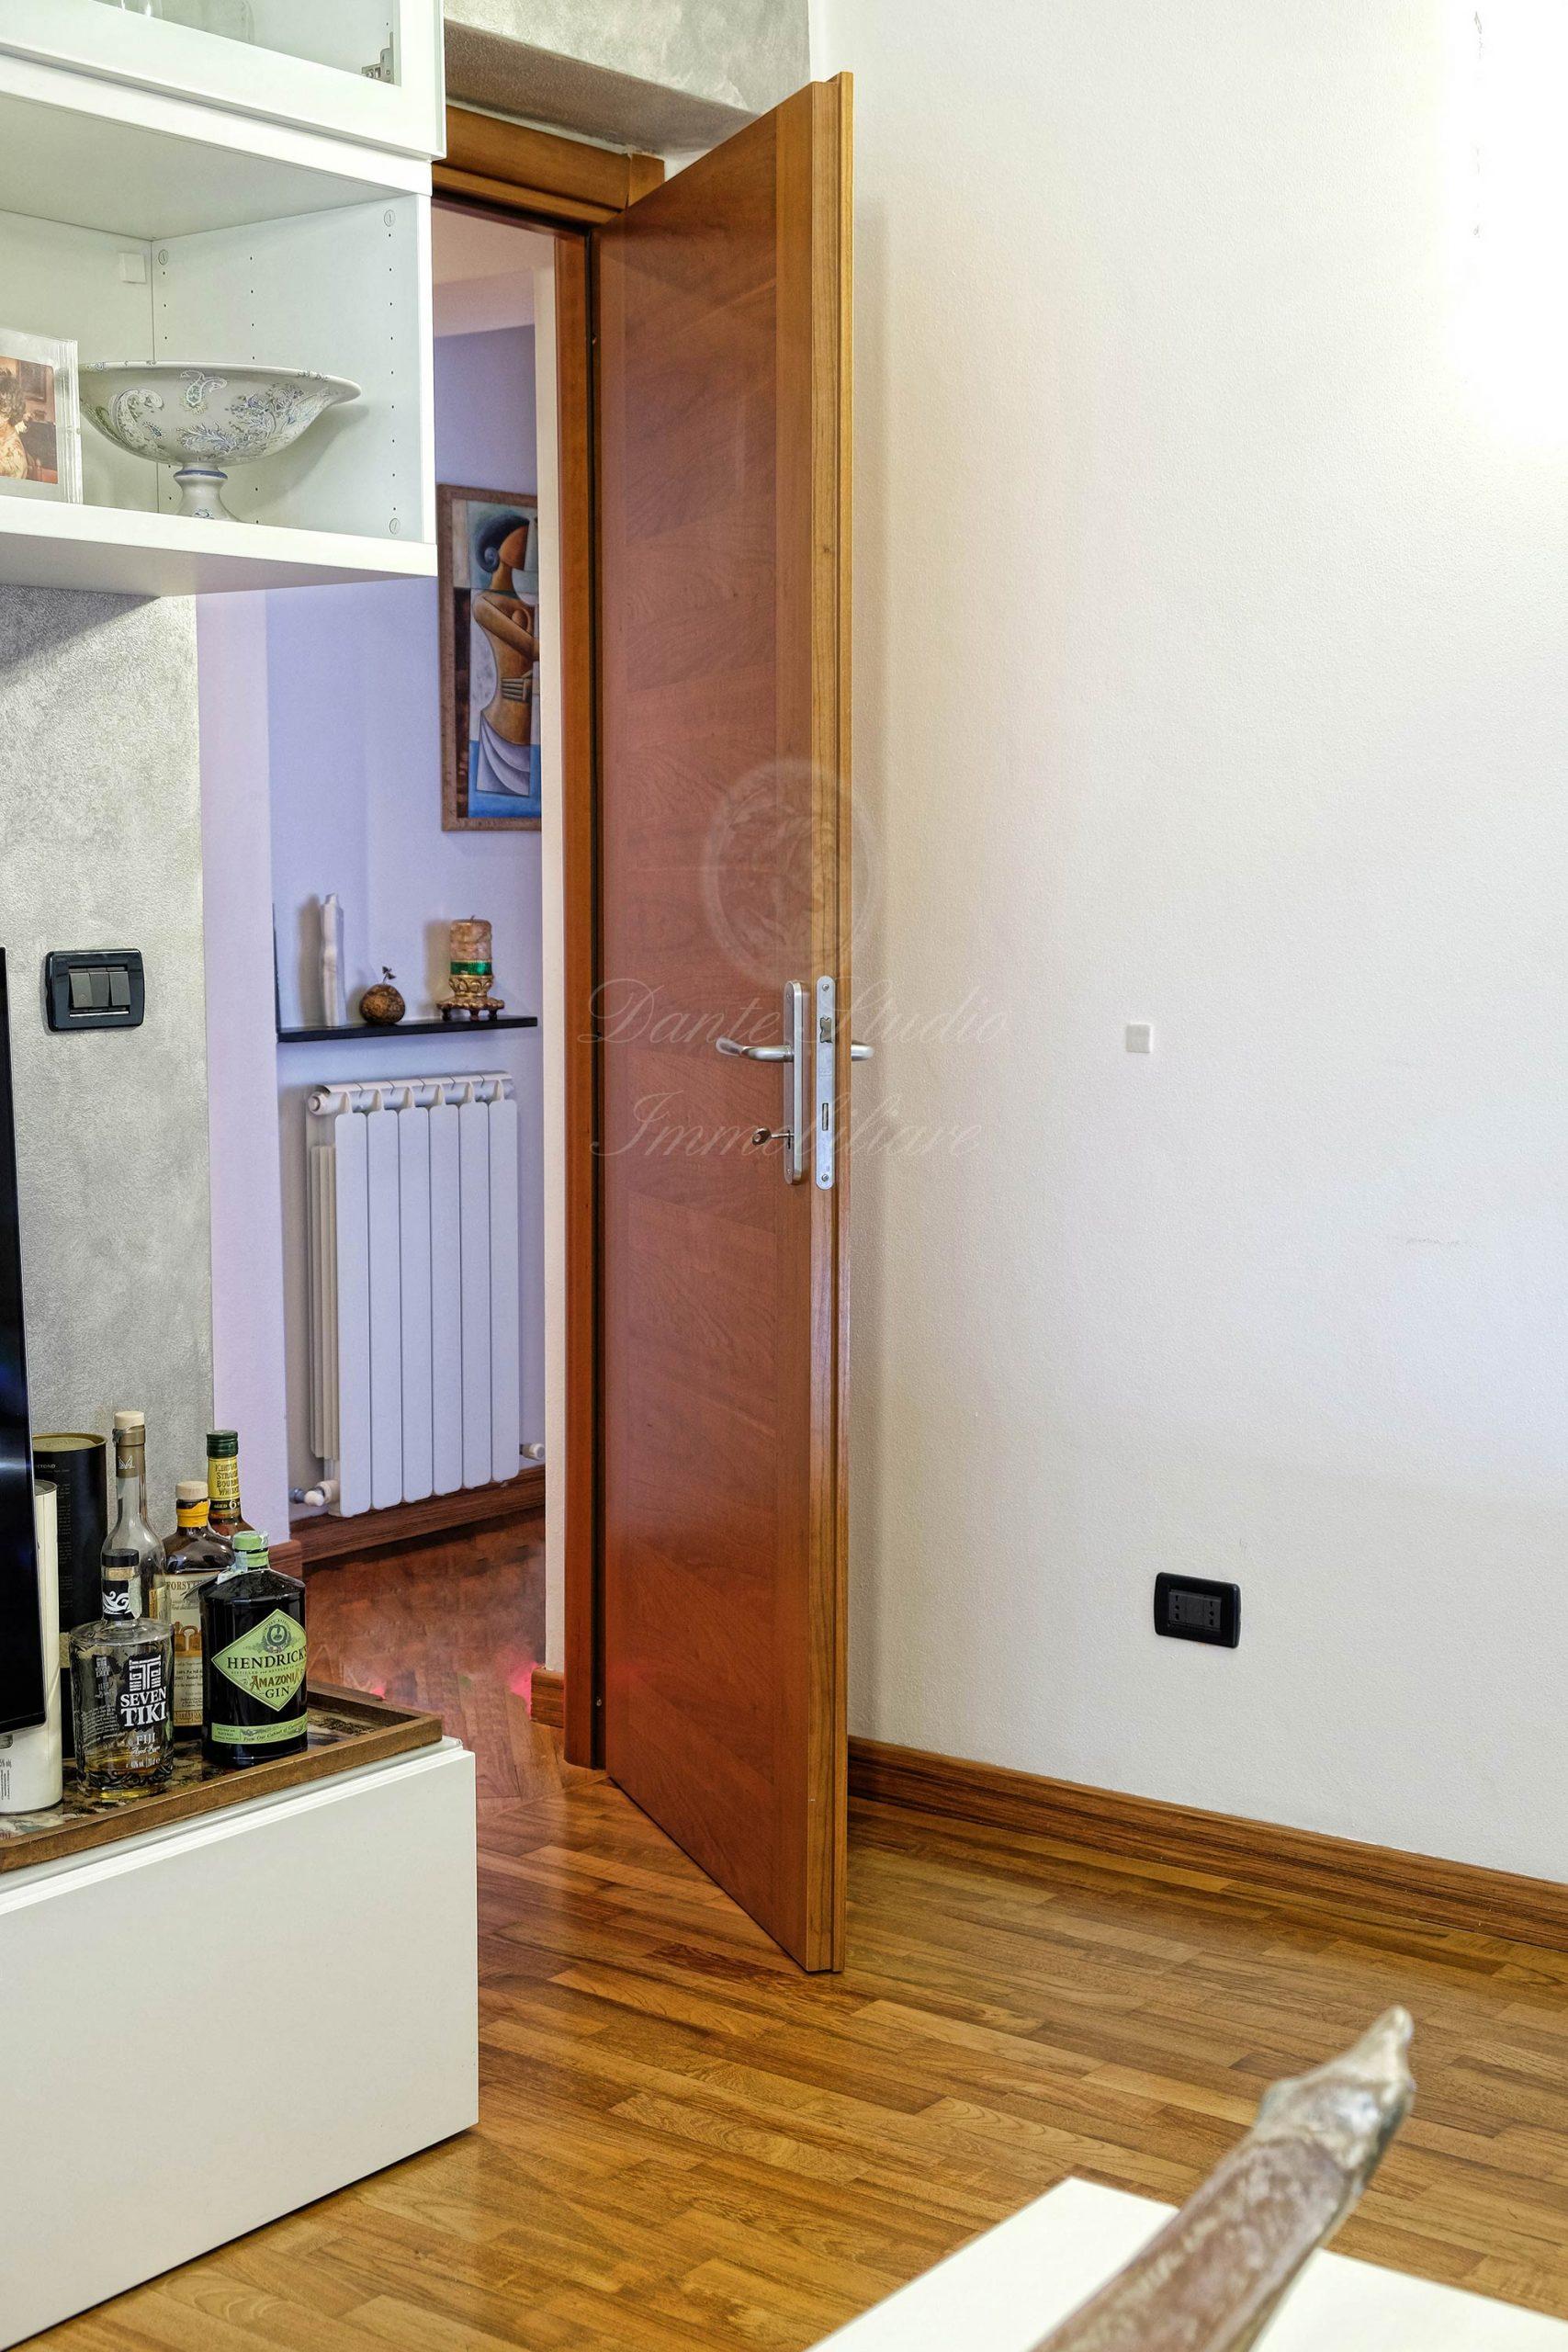 Carignano Via Nino Bixio extralusso 110 mq